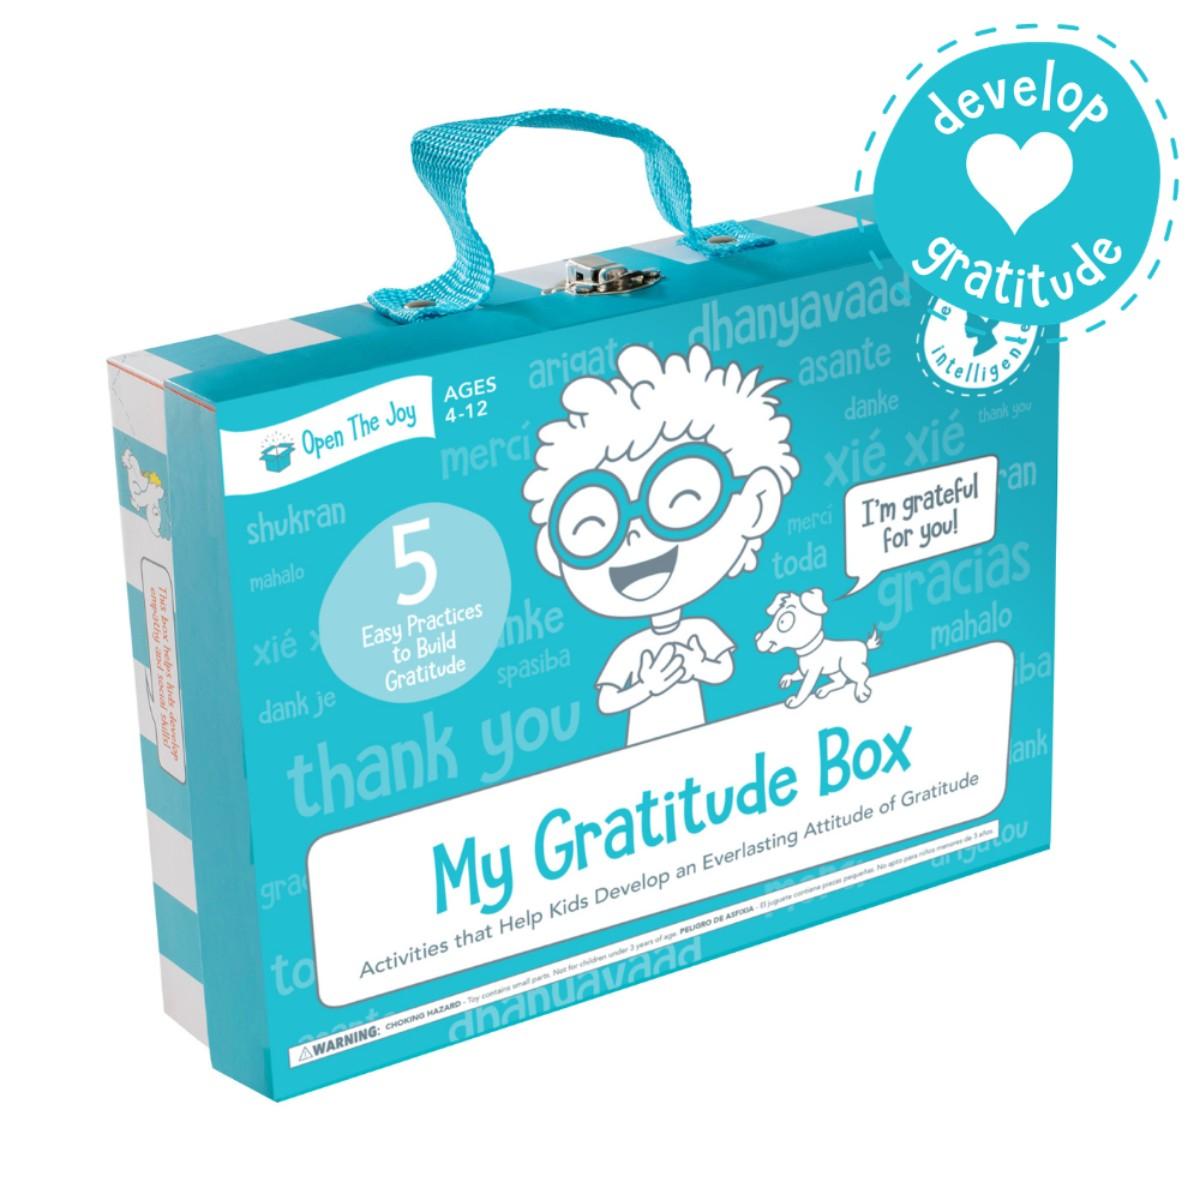 My Gratitude Box